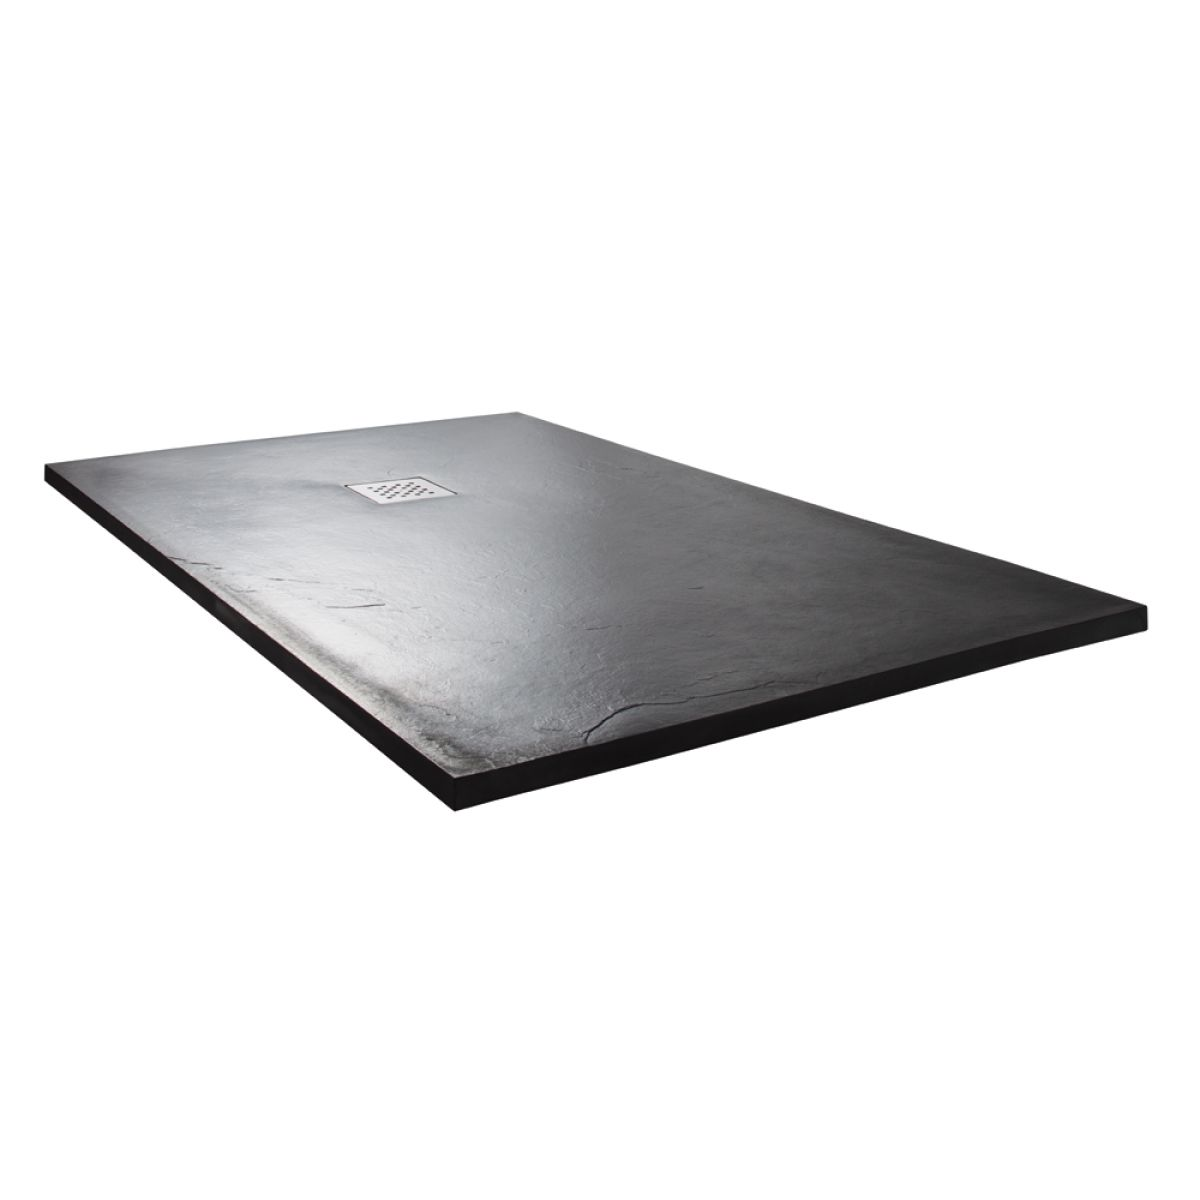 Cassellie Cass Stone Anthracite Slate Effect Rectangular Shower Tray 1200 x 900mm